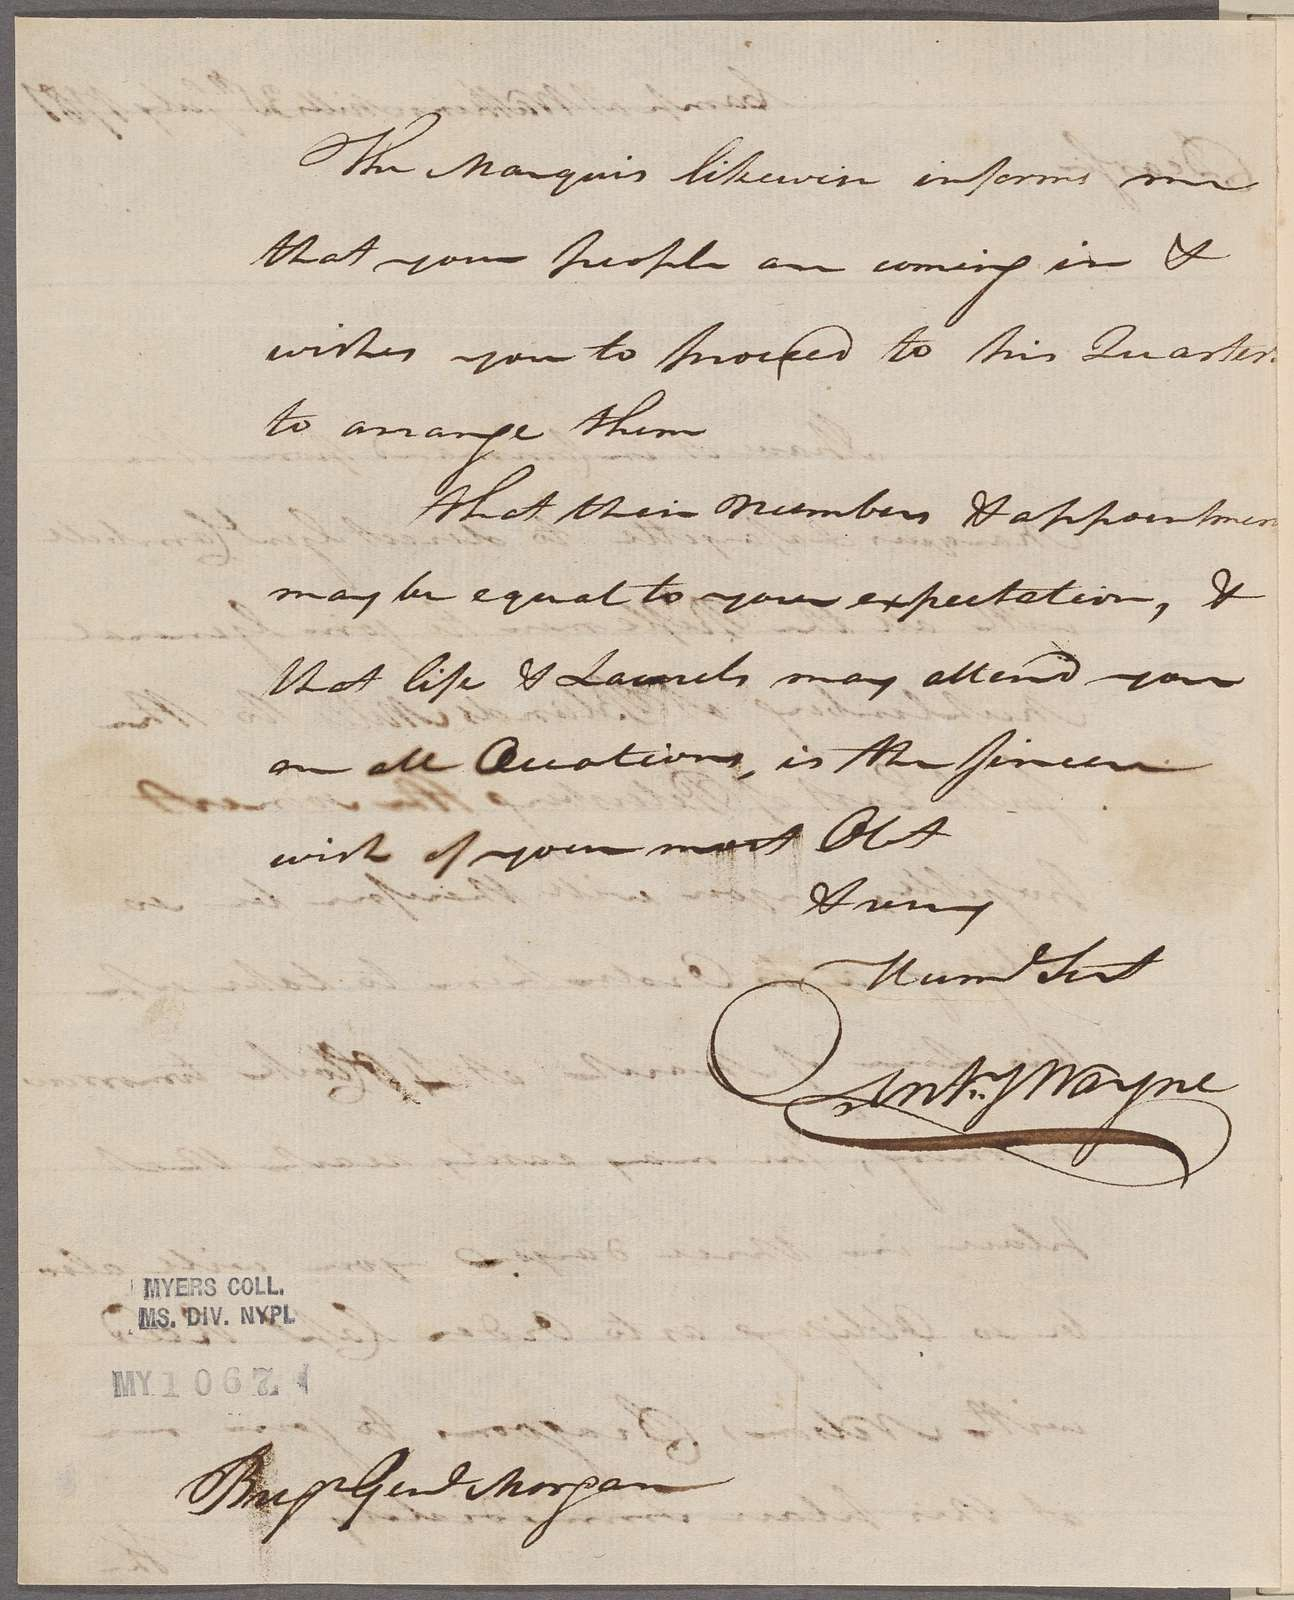 Wayne, Anthony. Camp at Watkins. To Brigadier General Morgan